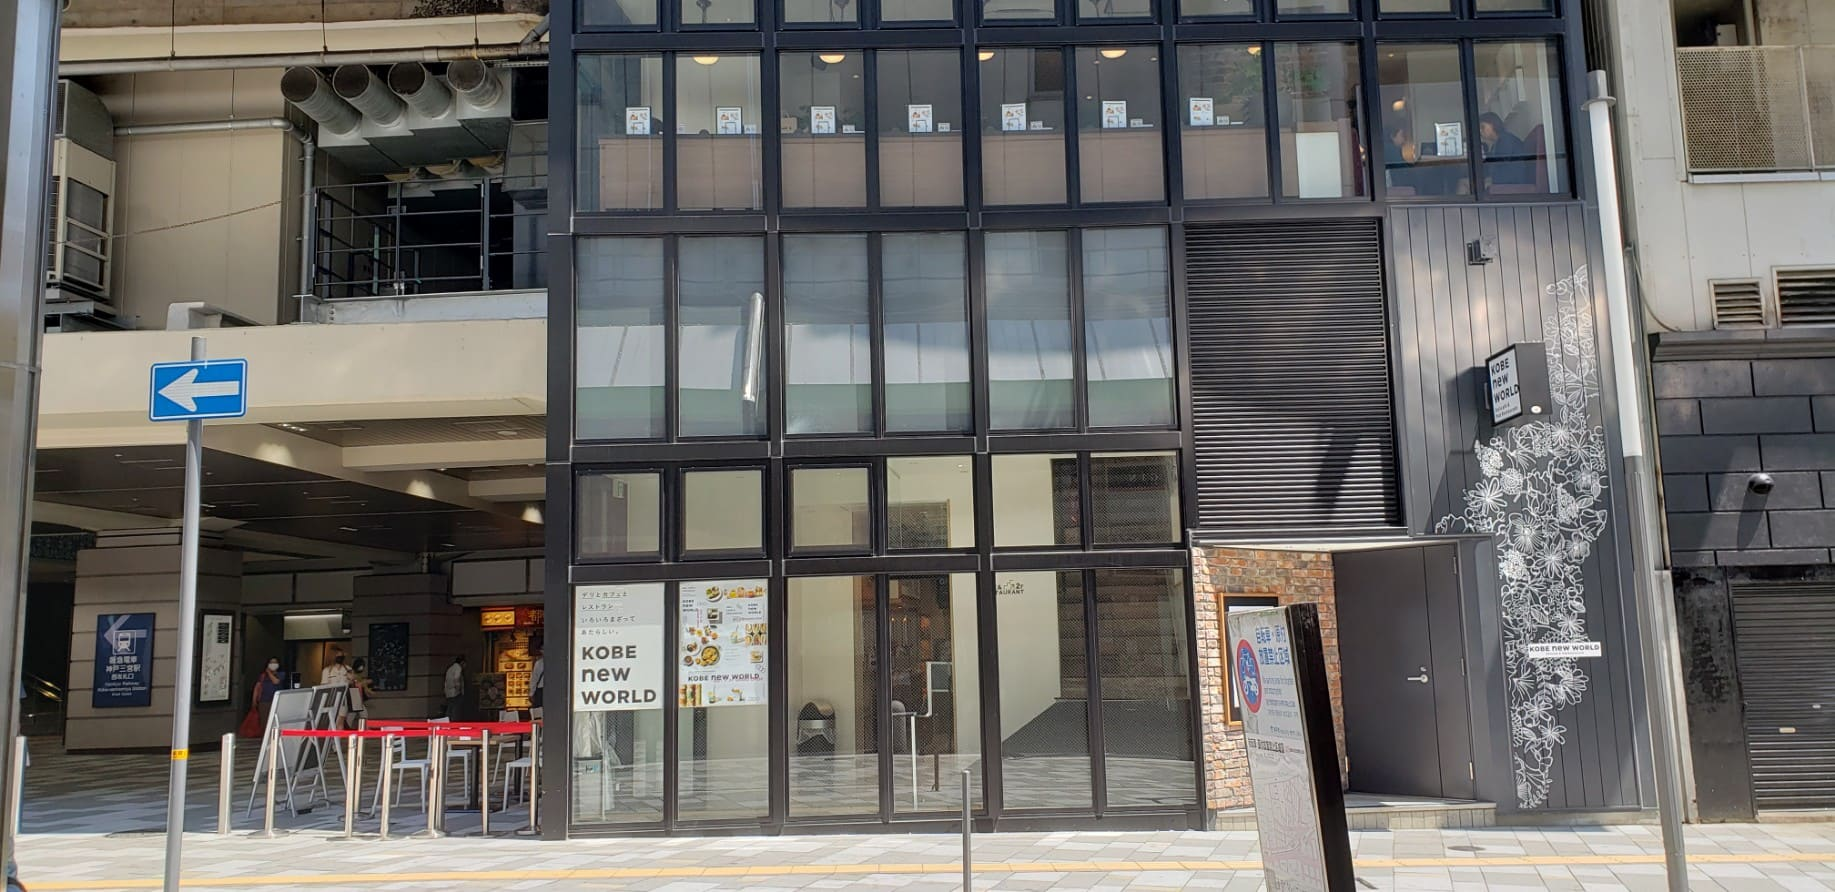 KOBE new WORLDの北側からのガラス張り2階建ての外観です。